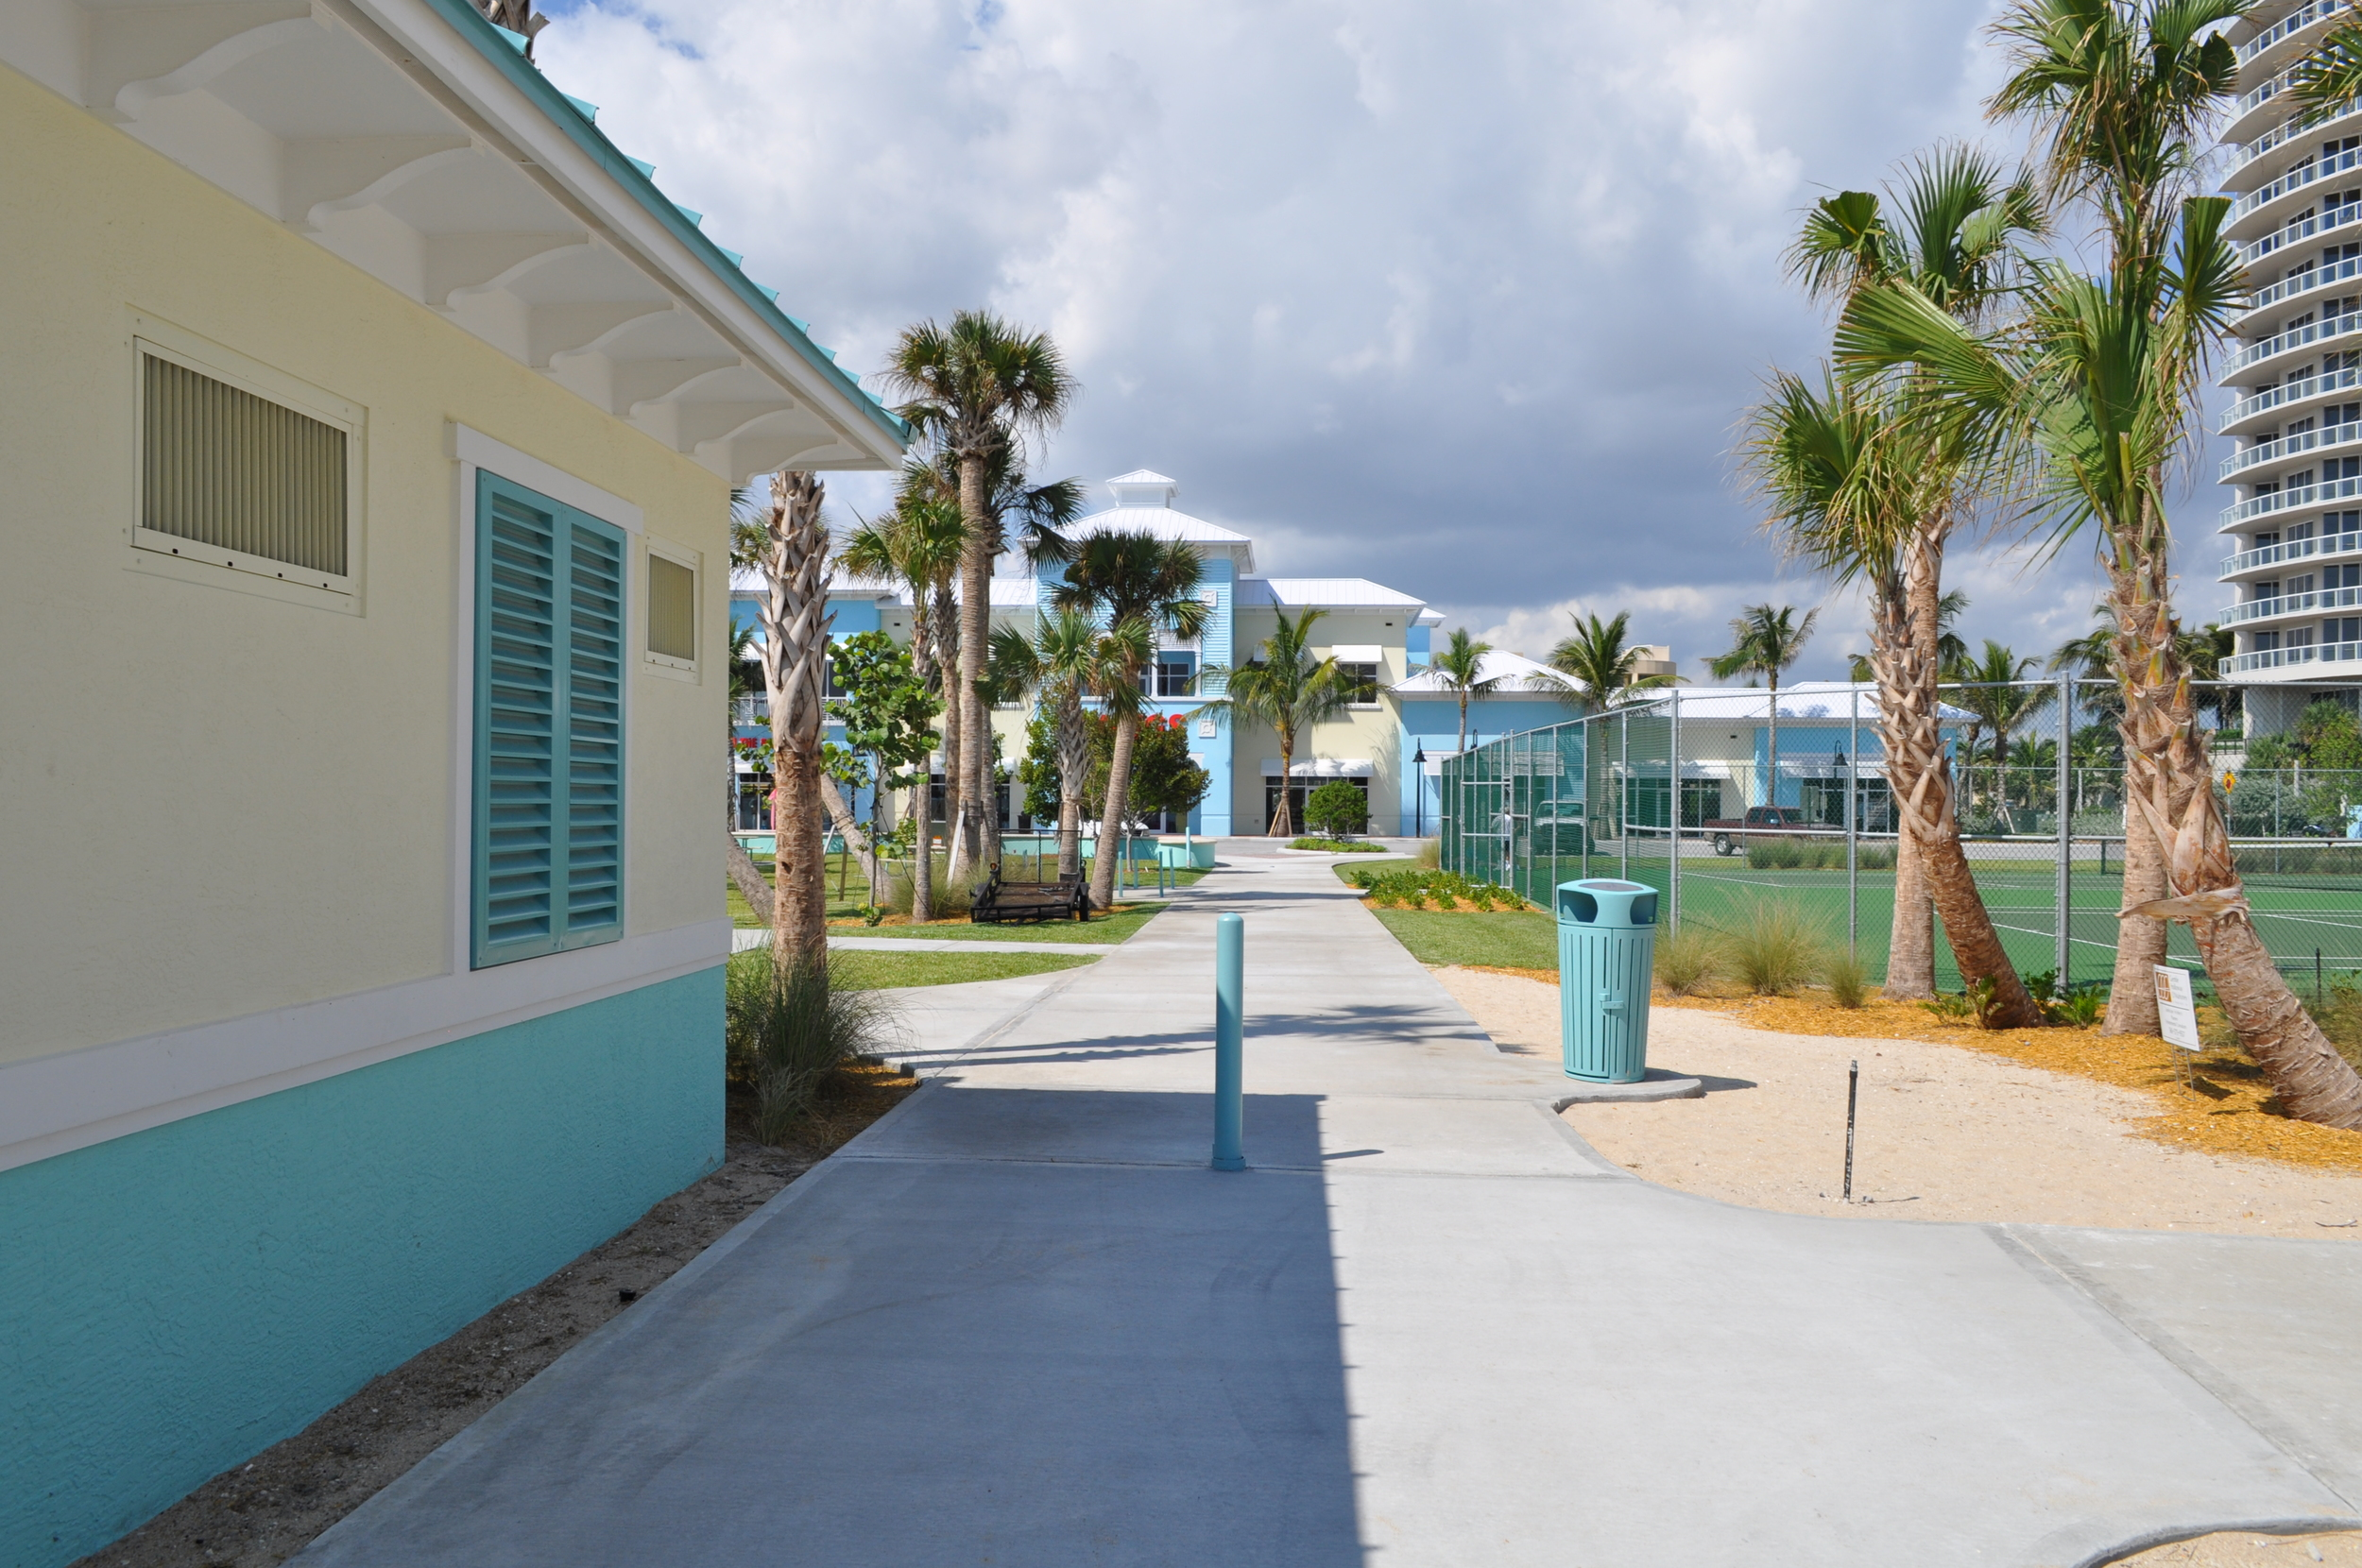 City of Riviera Beach Municipal Beach Park Ocean Mall Walk and Tennis Courts.jpg